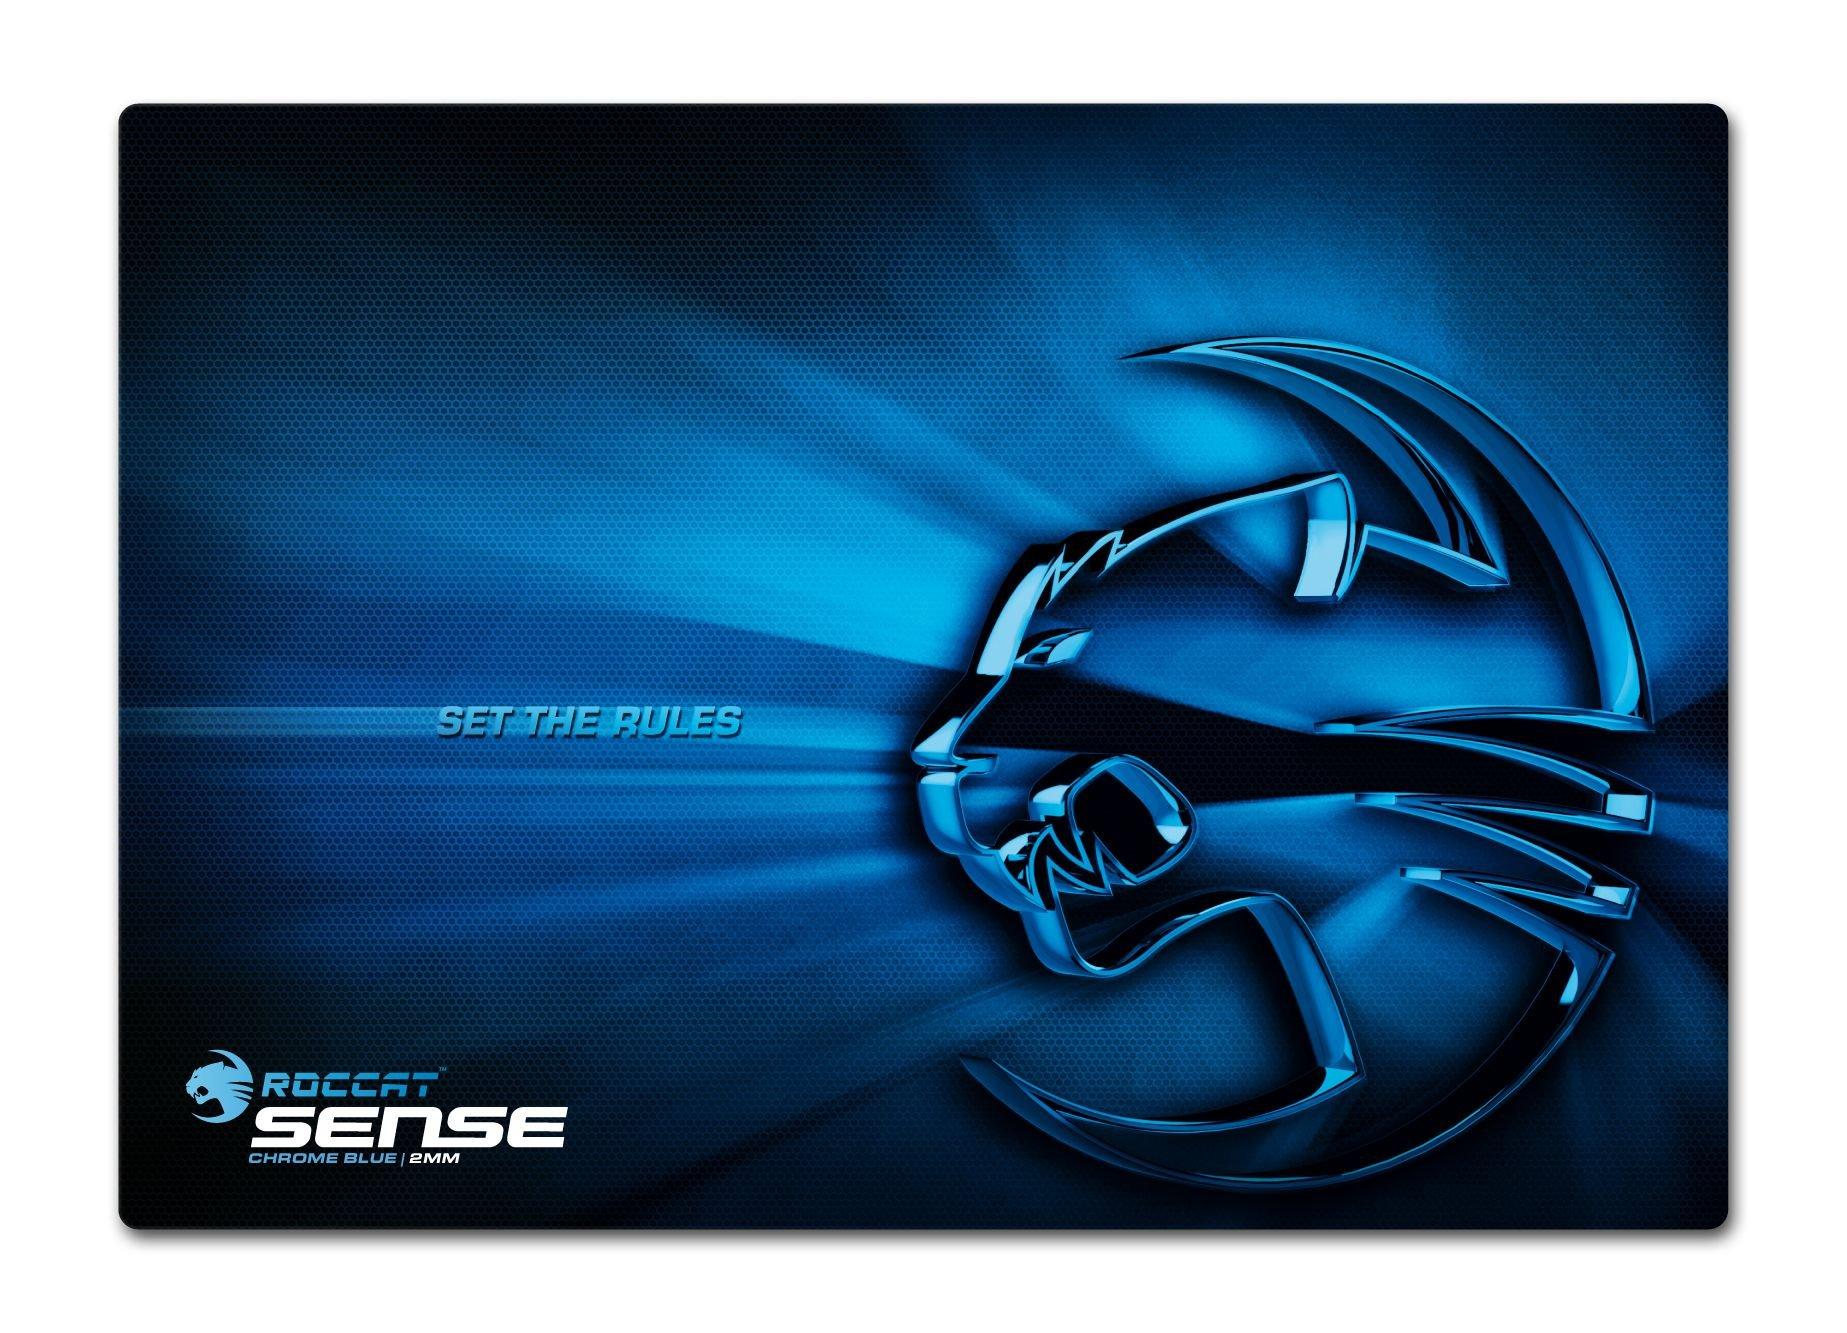 Mousepad ROCCAT Sense - Chrome Blue - High Precision Gaming